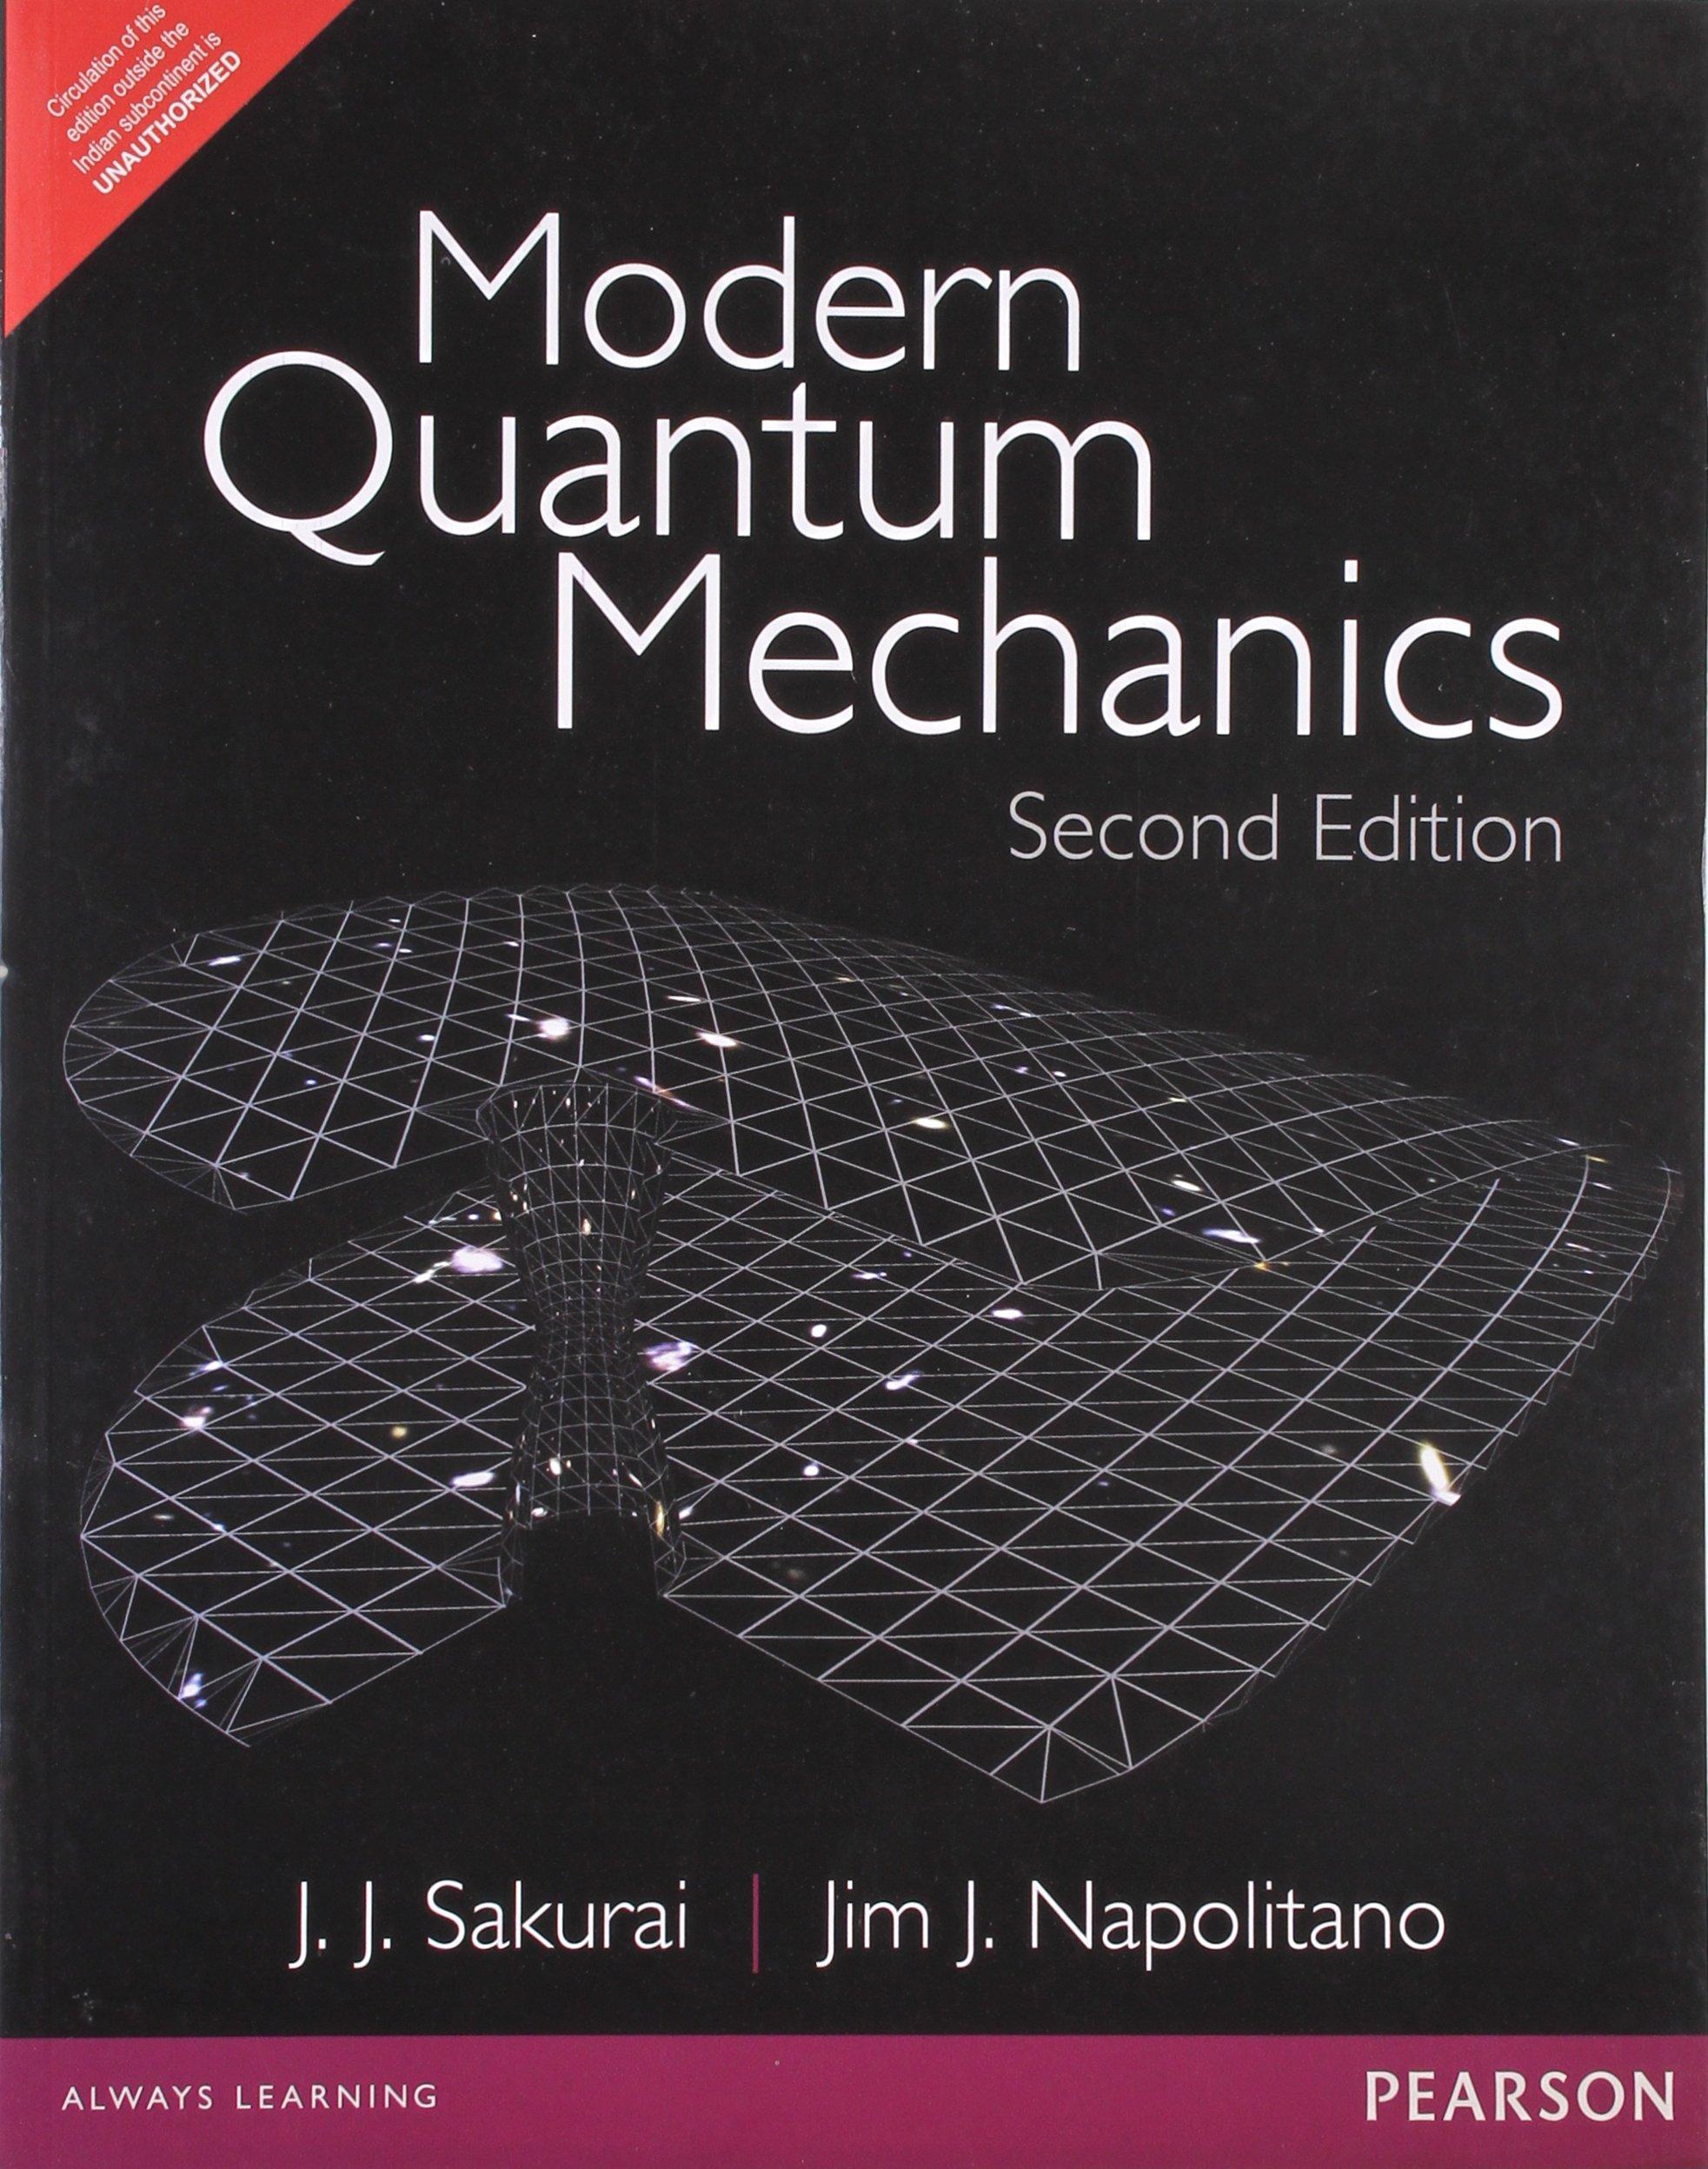 Modern Quantum Mechanics: PNIE: J. J. Sakurai, Jim Napolitano:  9789332519008: Books - Amazon.ca